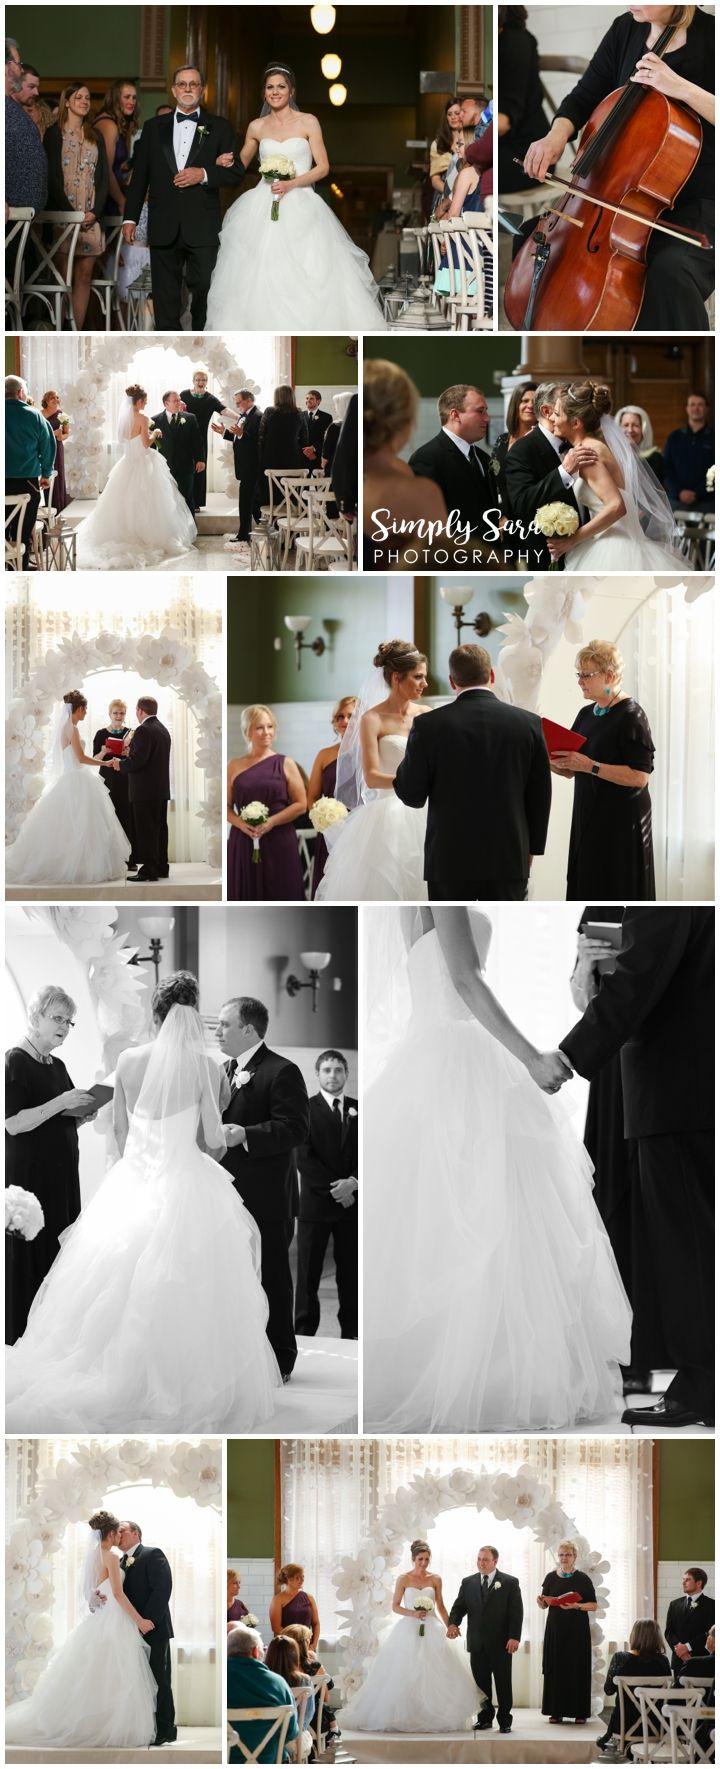 Wedding Photo Ideas - Ceremony - Bride - Groom - Officiant - String ...